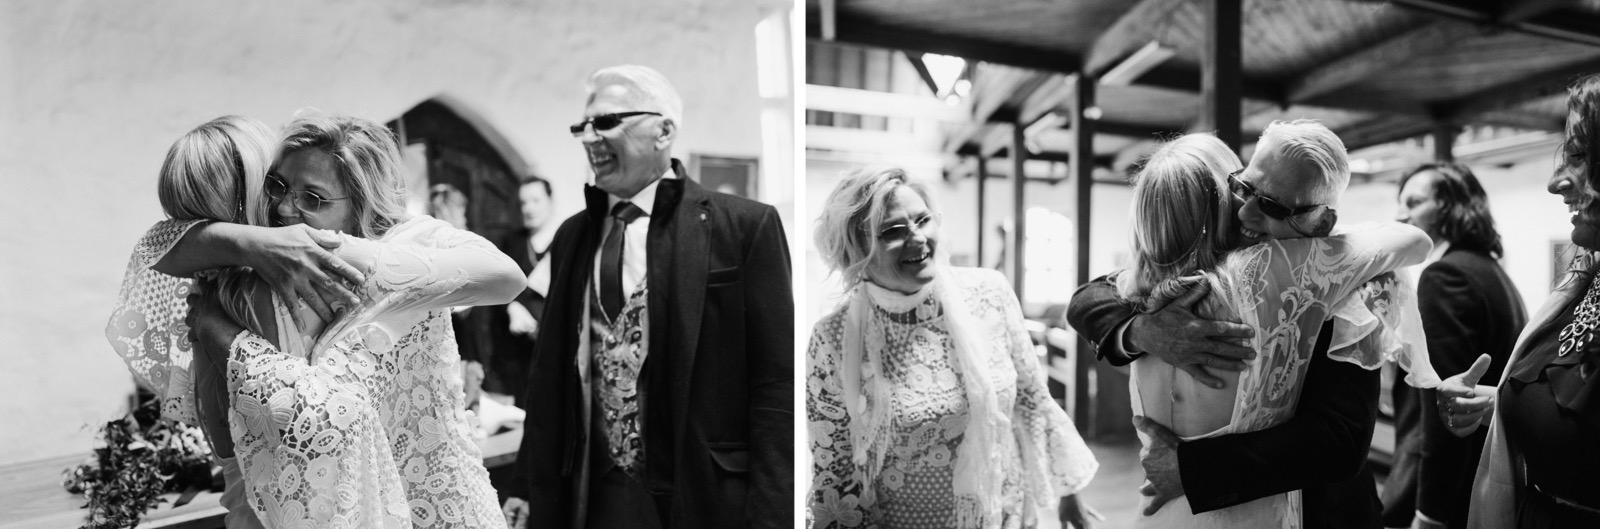 documentary-wedding-photography 00088